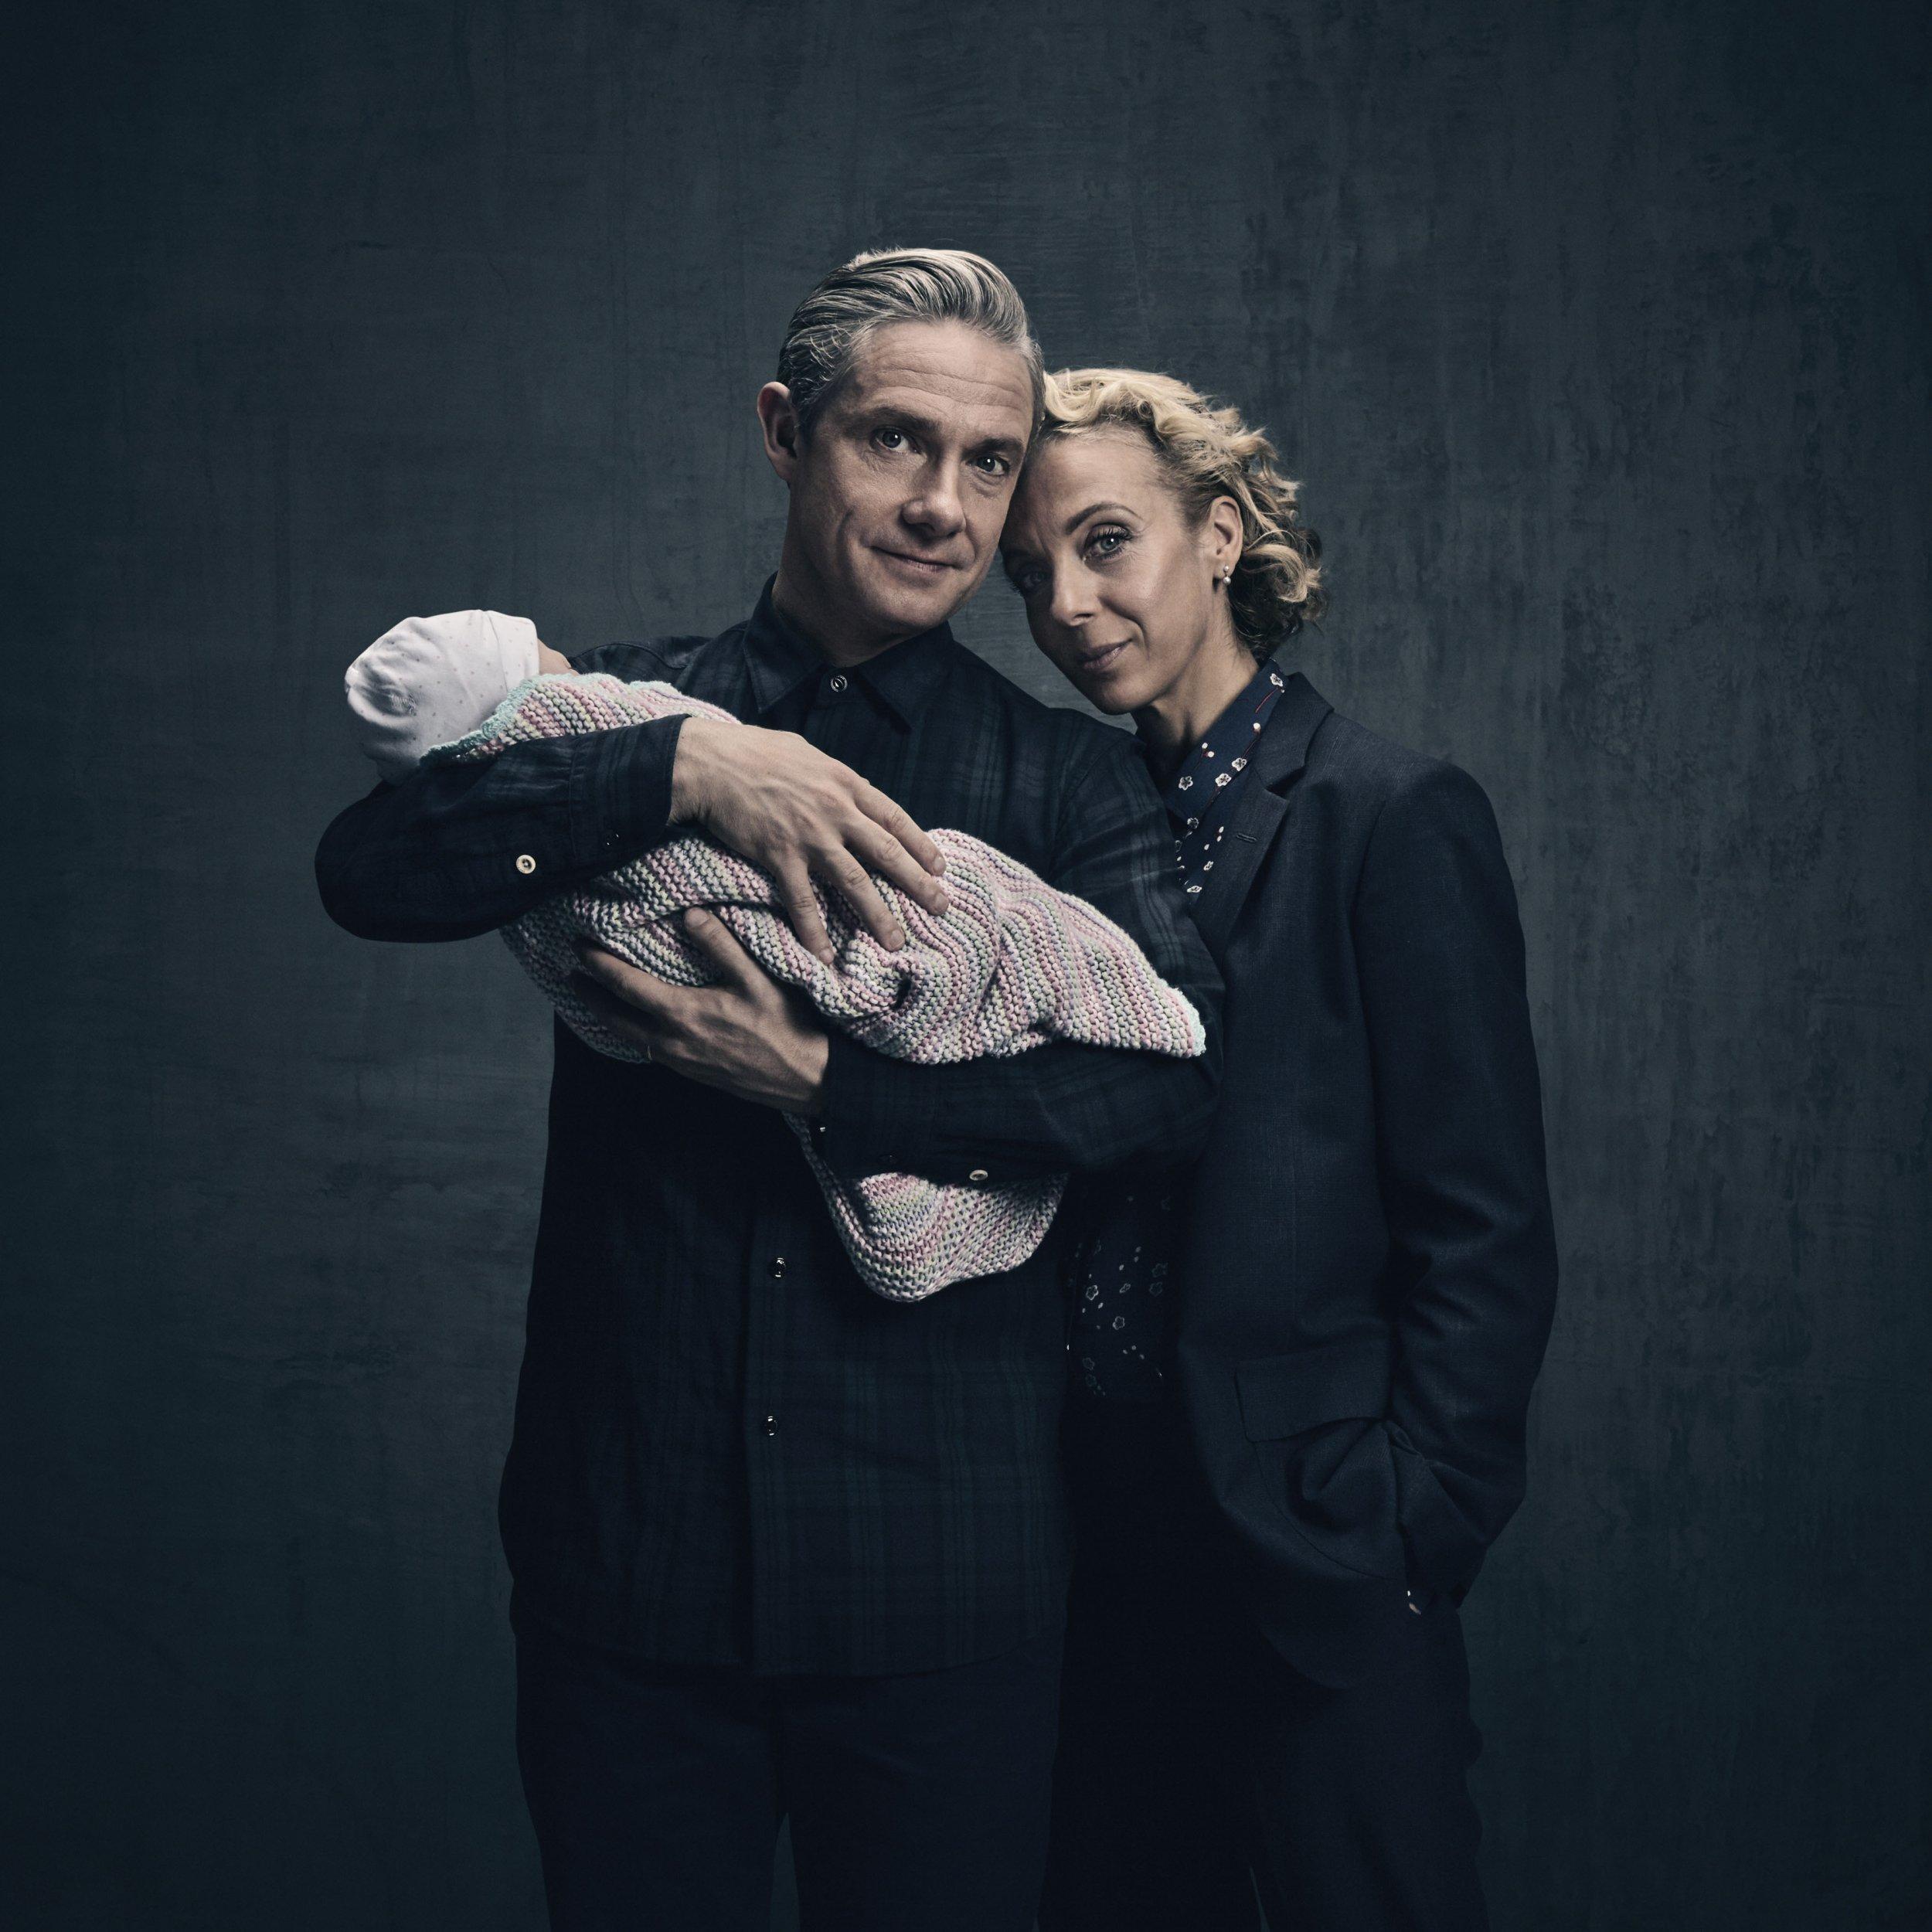 Sherlock - Martin Freeman and Amanda Abbington